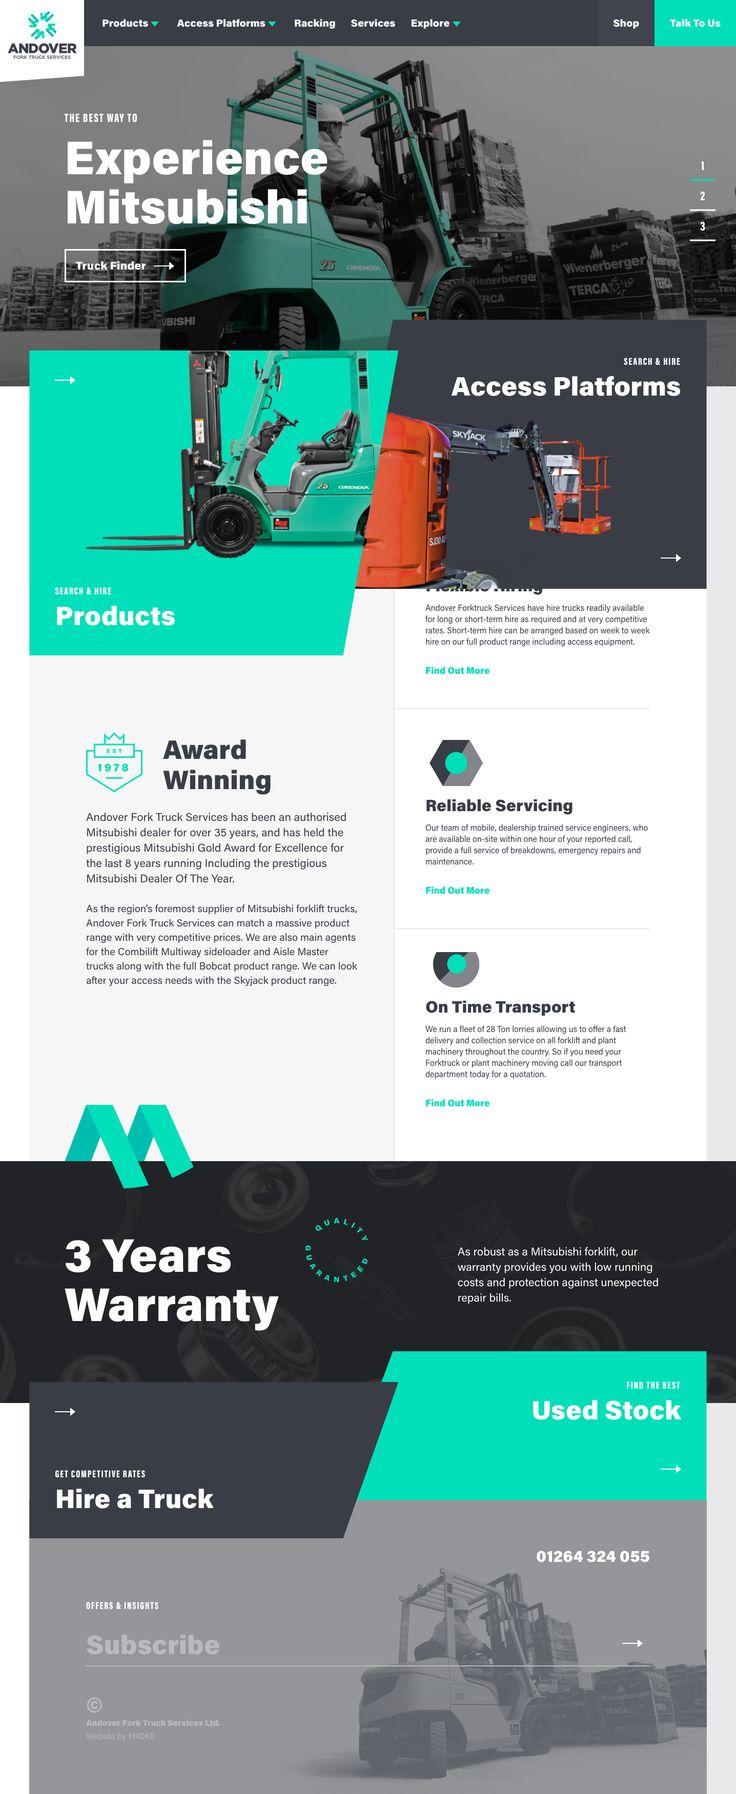 32 best web design images on pinterest design web design websites brand development traditional print work and bespoke wordpress website design and build for andover forktruck services fandeluxe Gallery